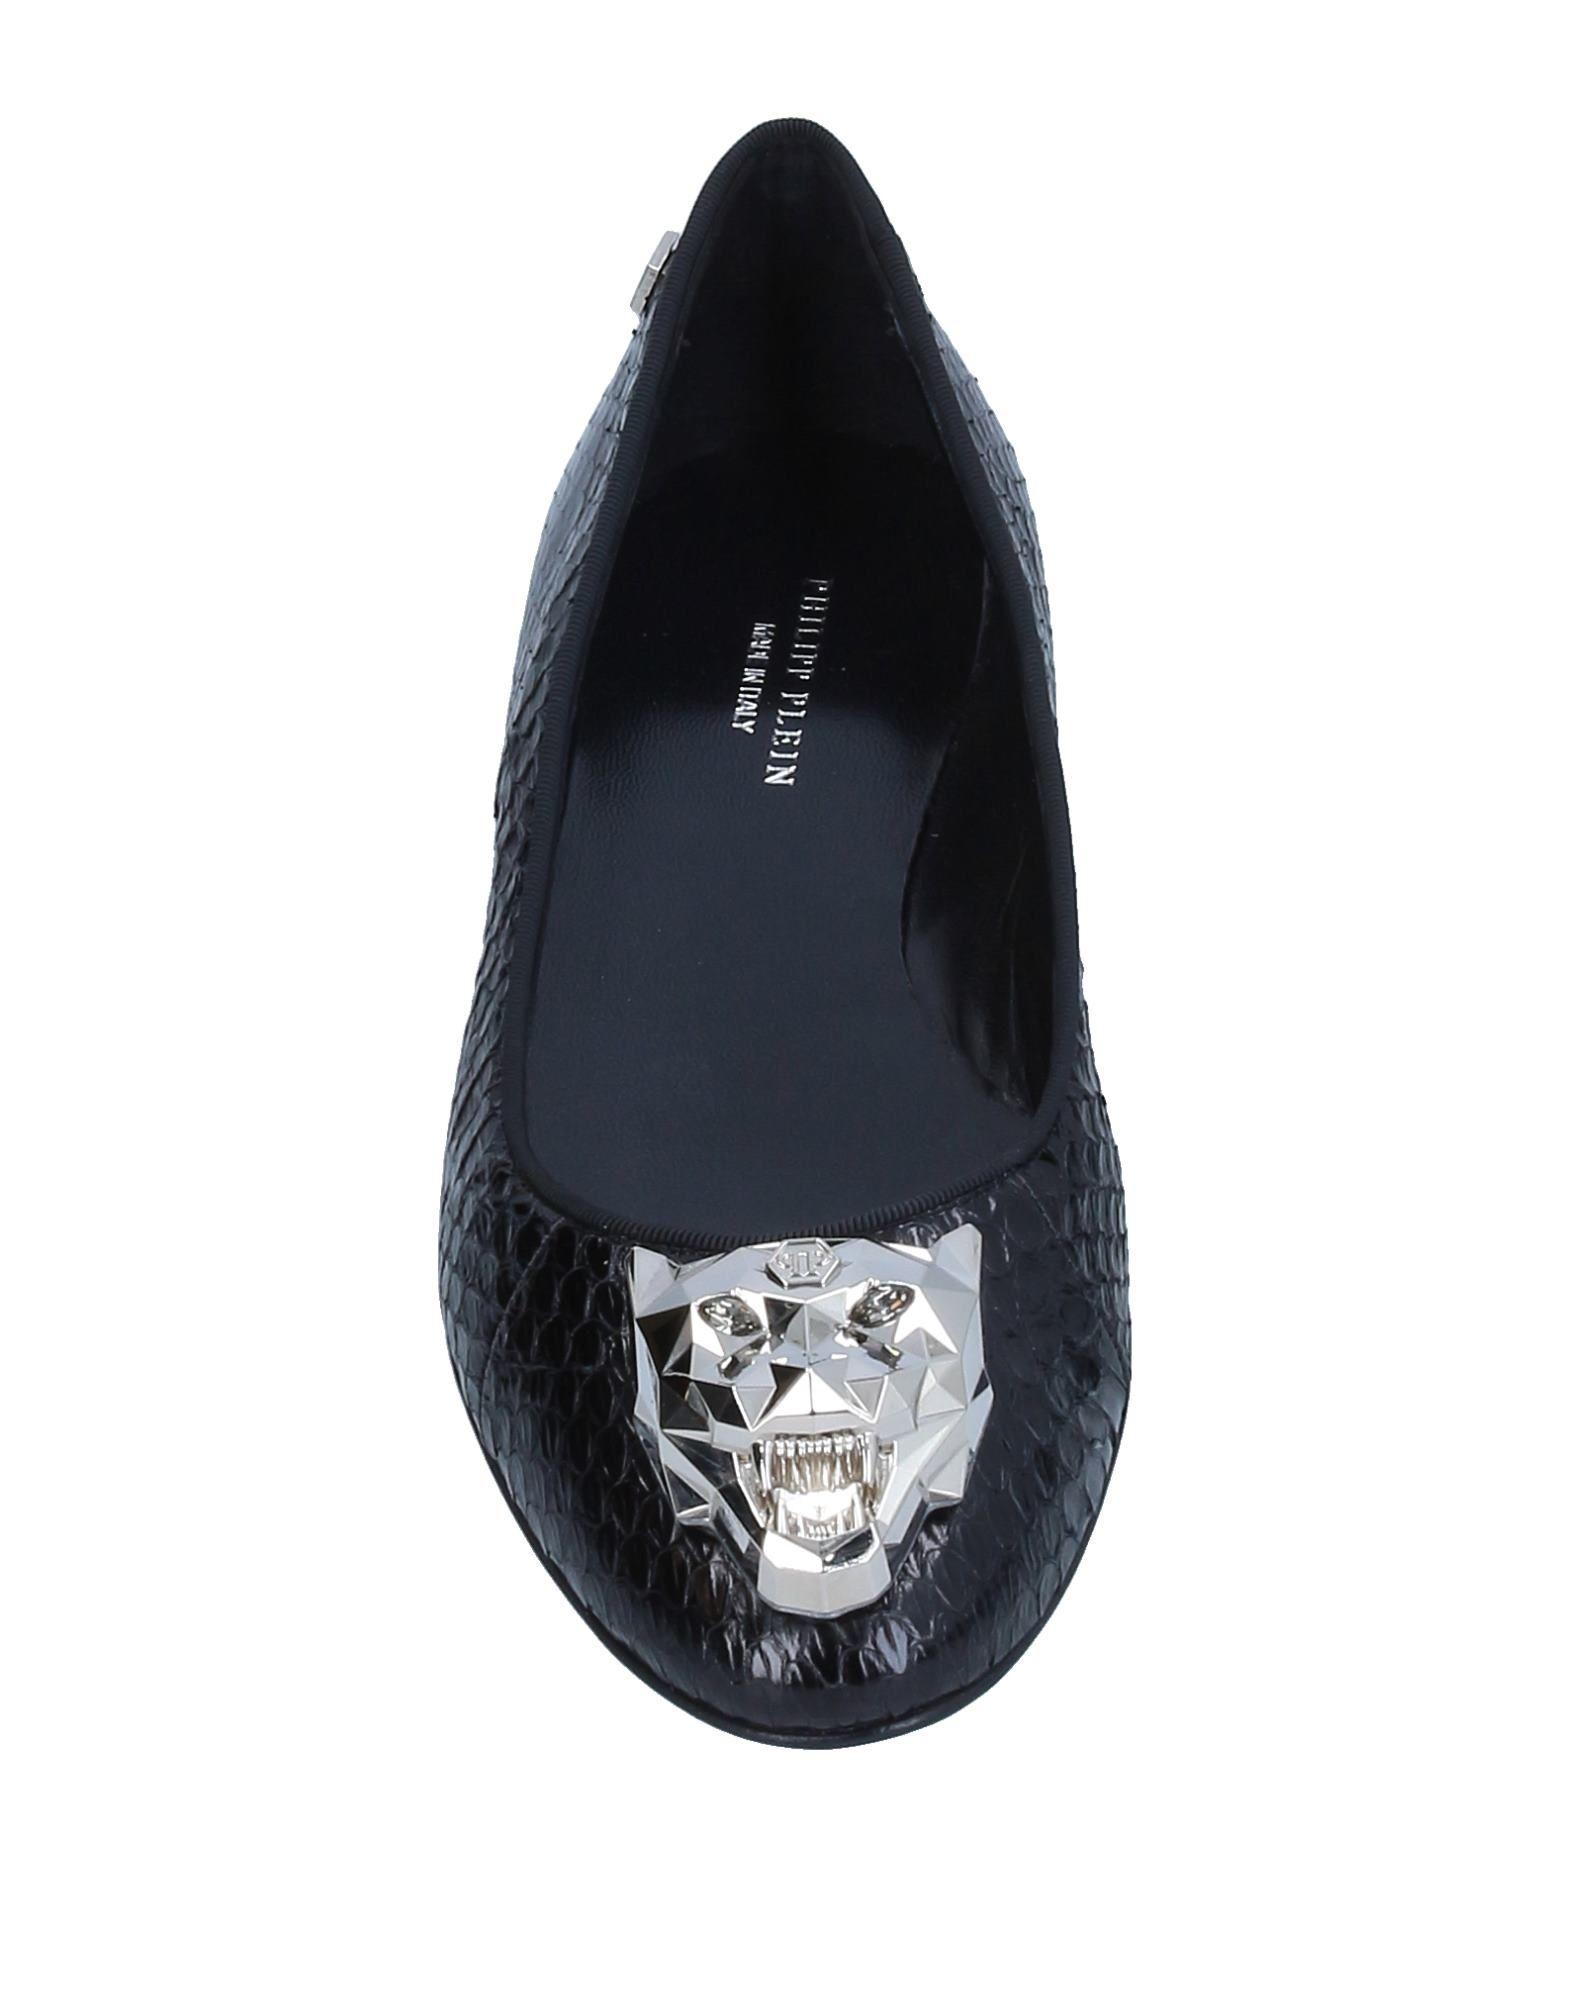 Philipp Plein Ballerinas Damen  Schuhe 11348188PX Beliebte Schuhe  5fe70c